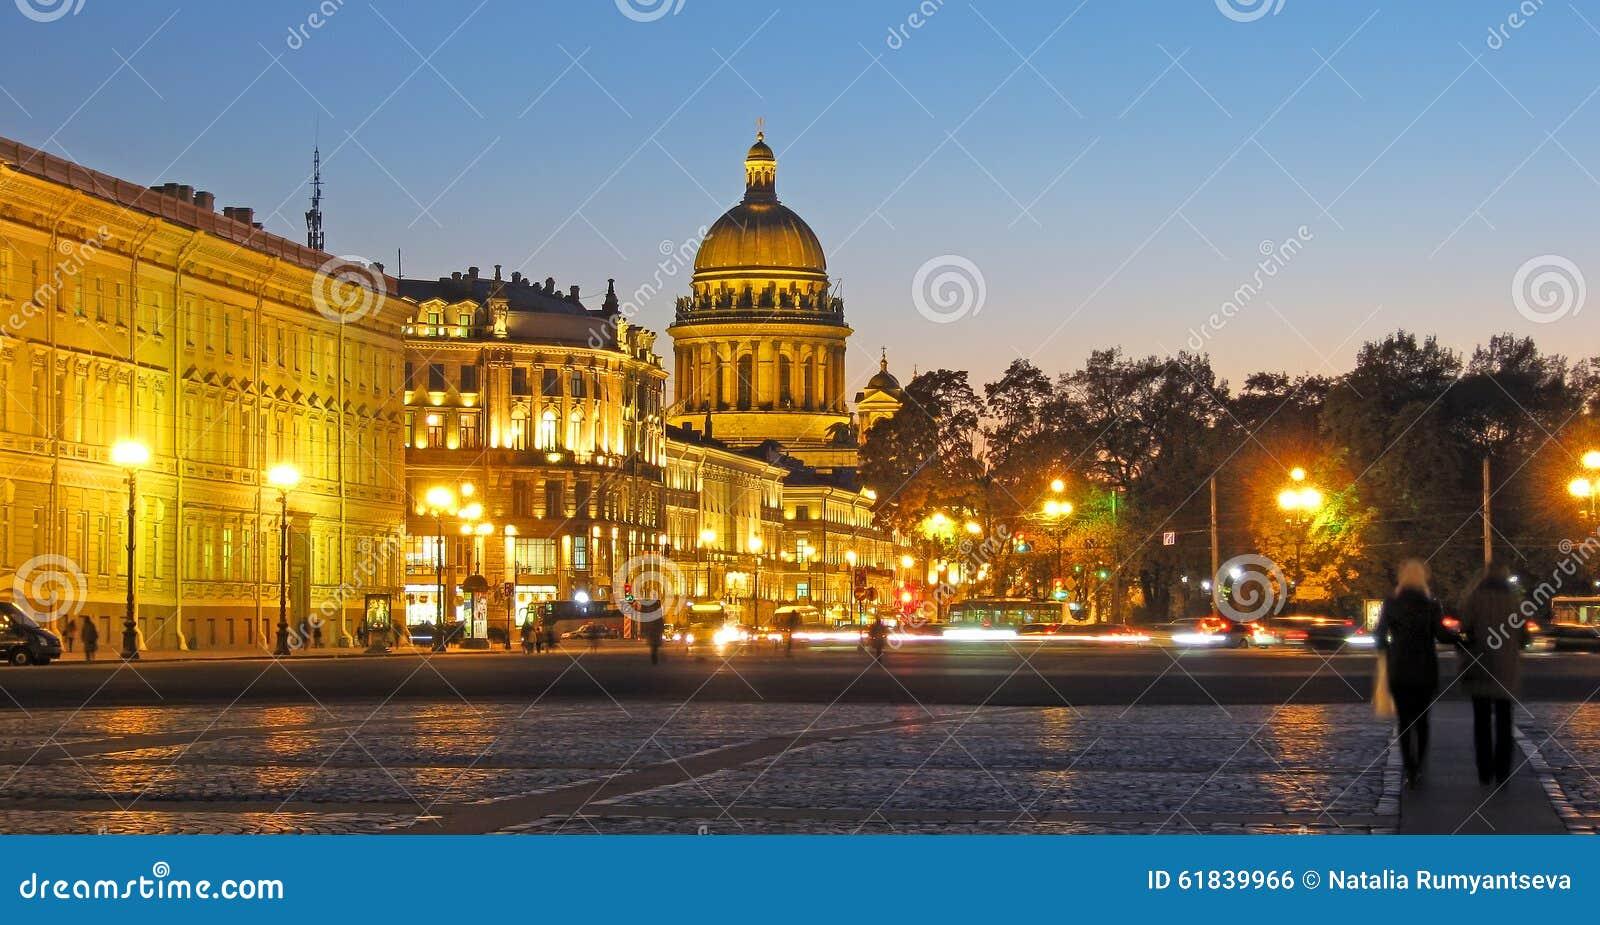 Санкт-Петербург Россия Собор St Isaac's